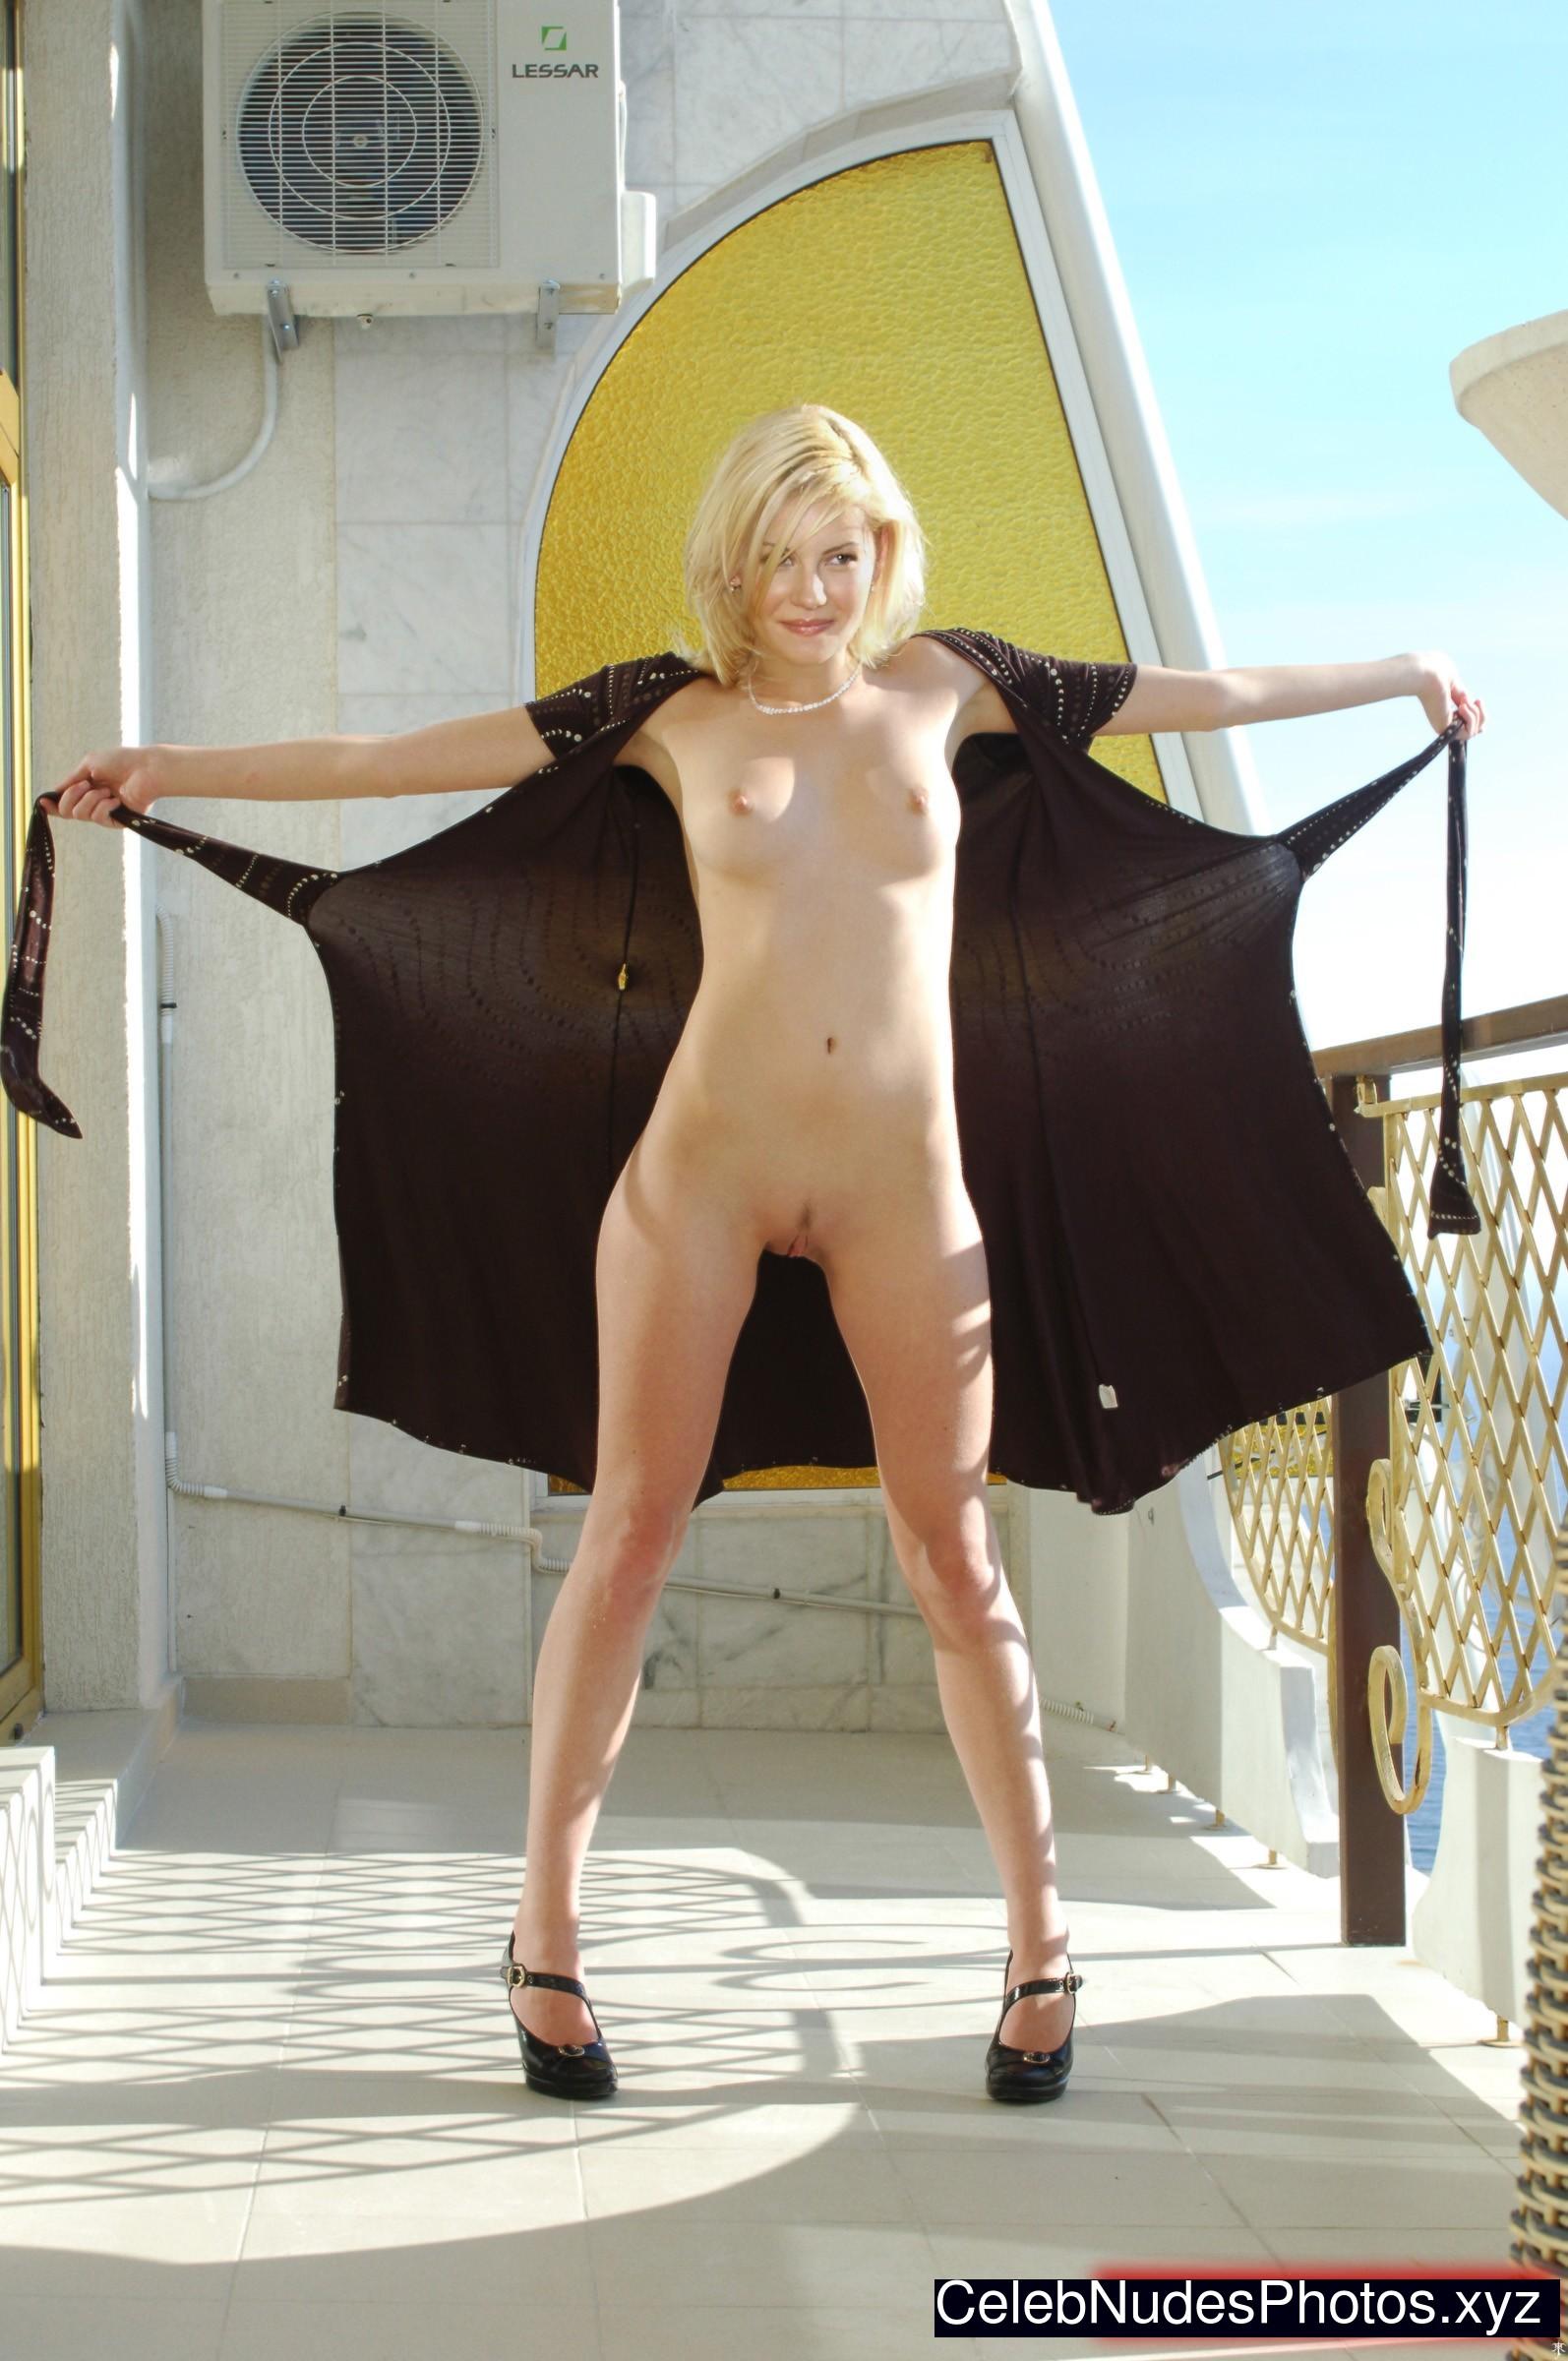 You hard Celebrity nude elisha cuthbert agree with